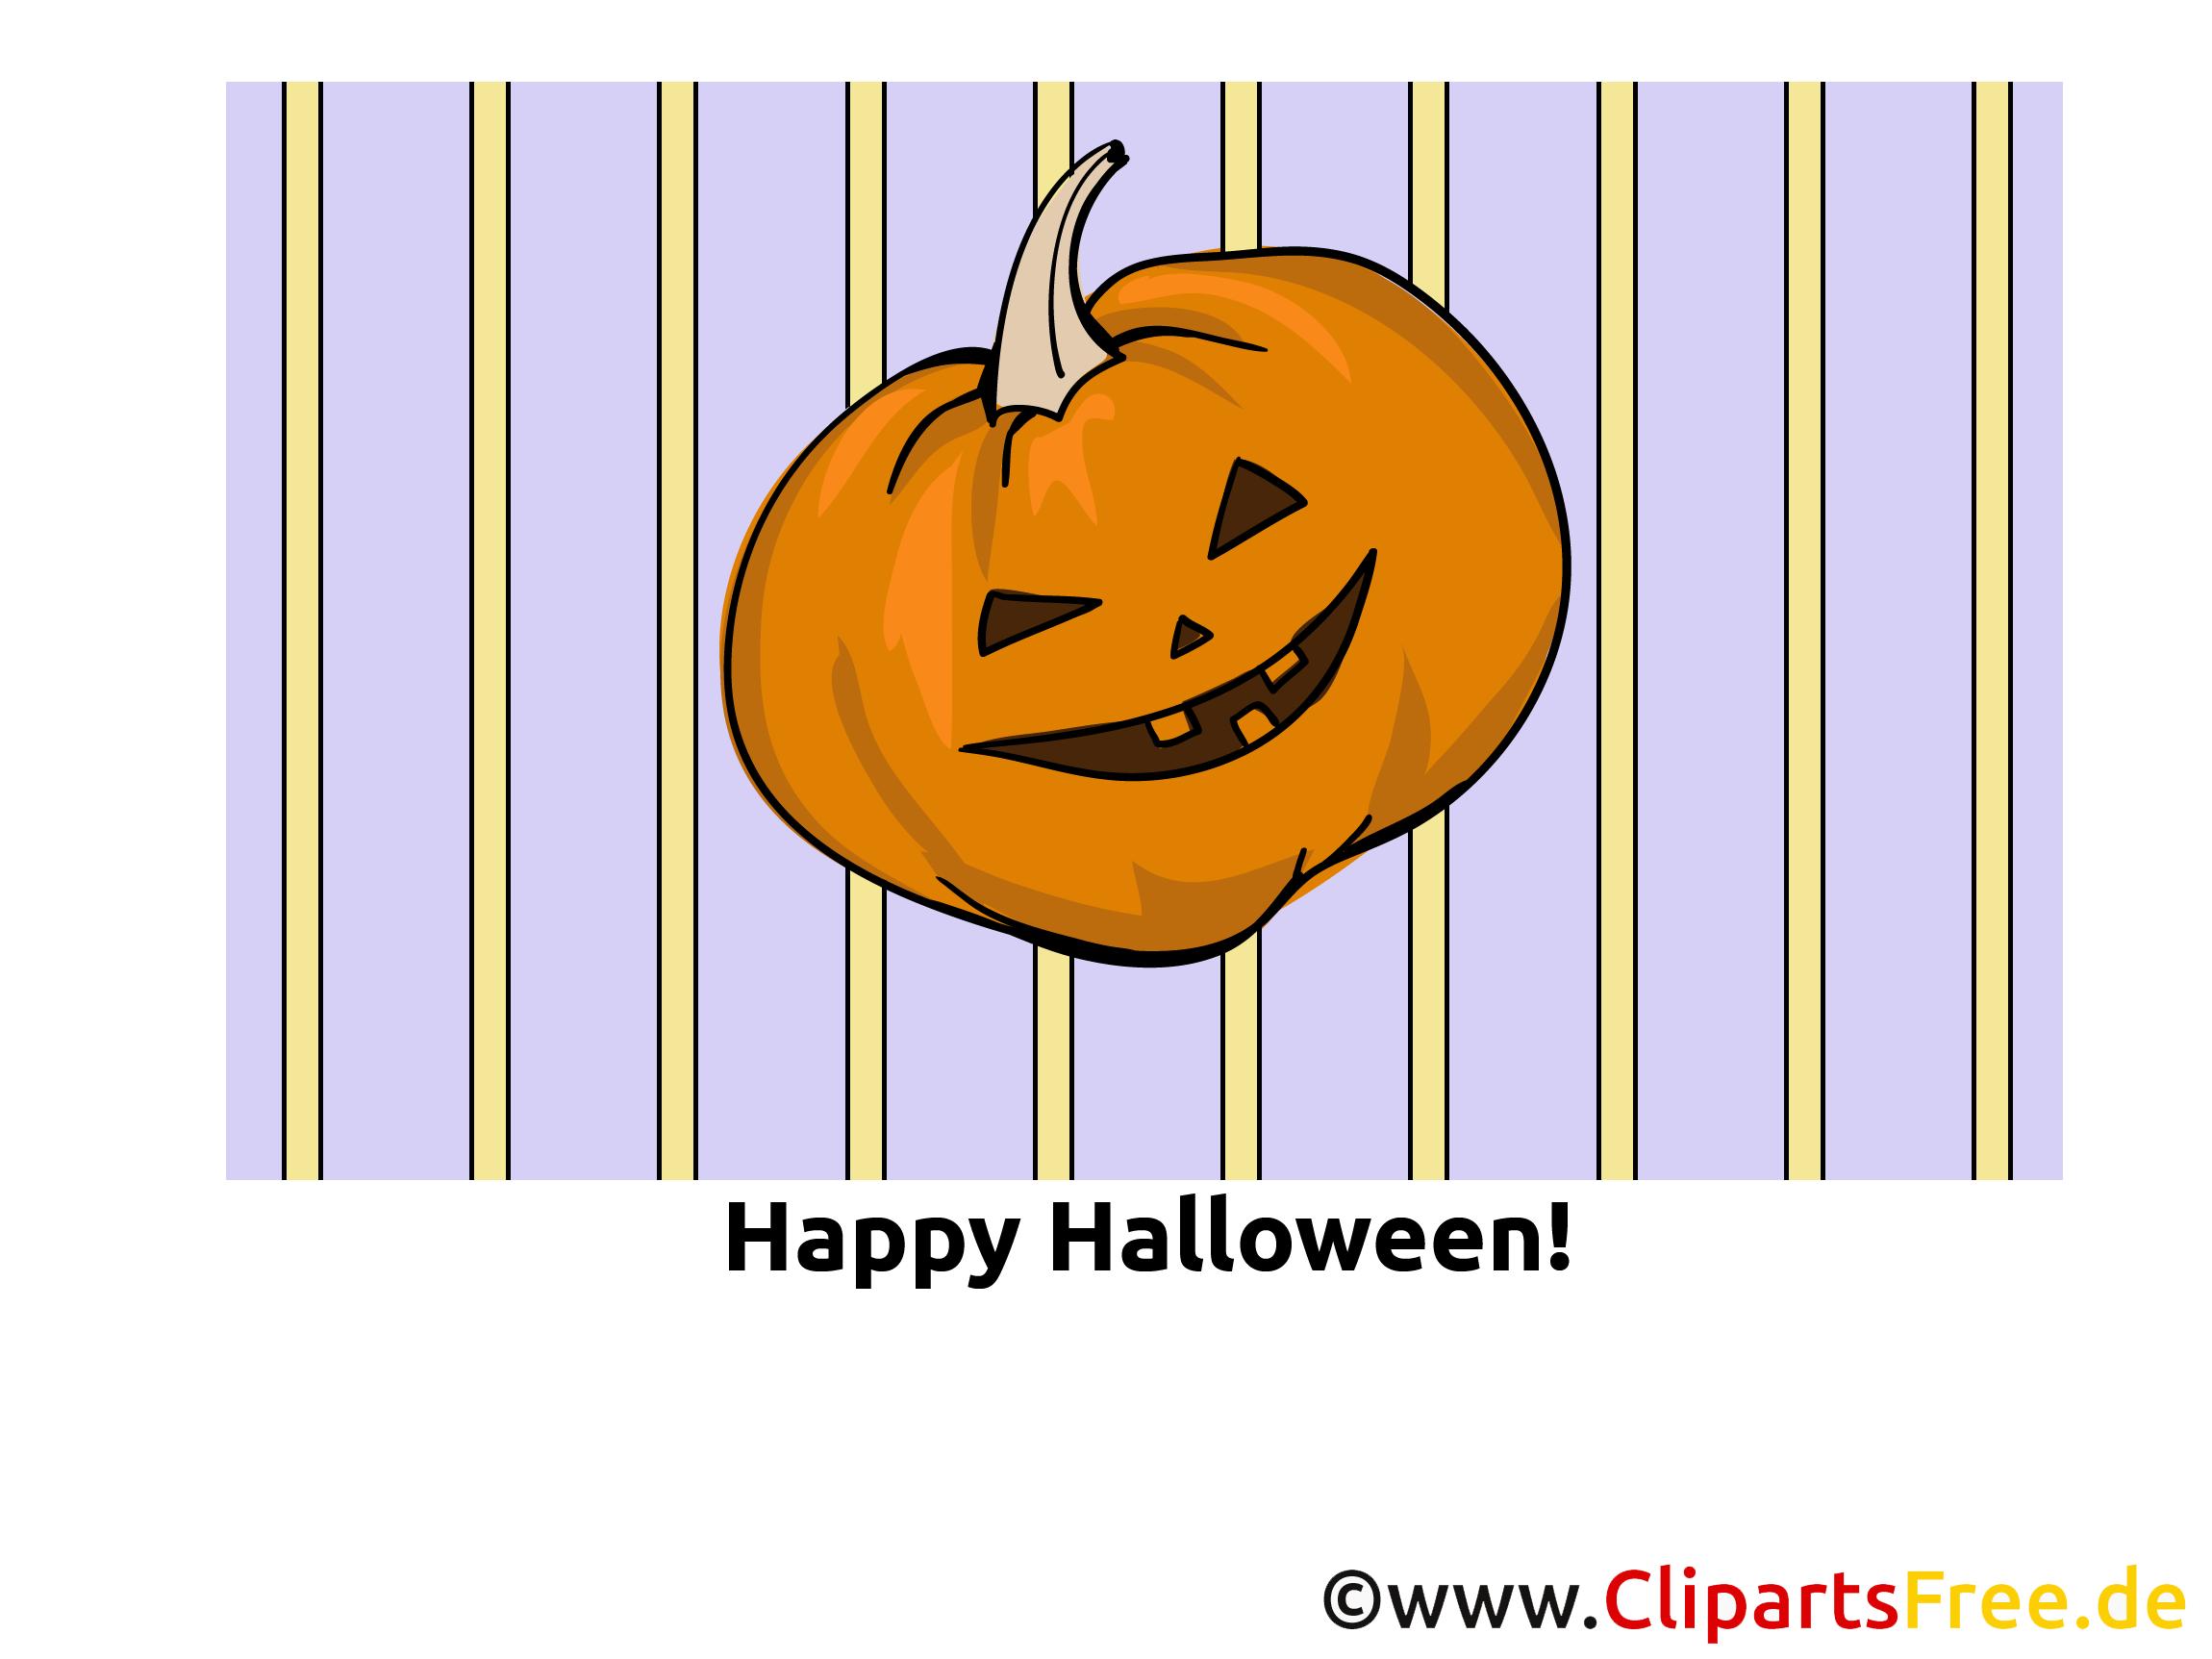 Kürbis Cartoon zu Halloween